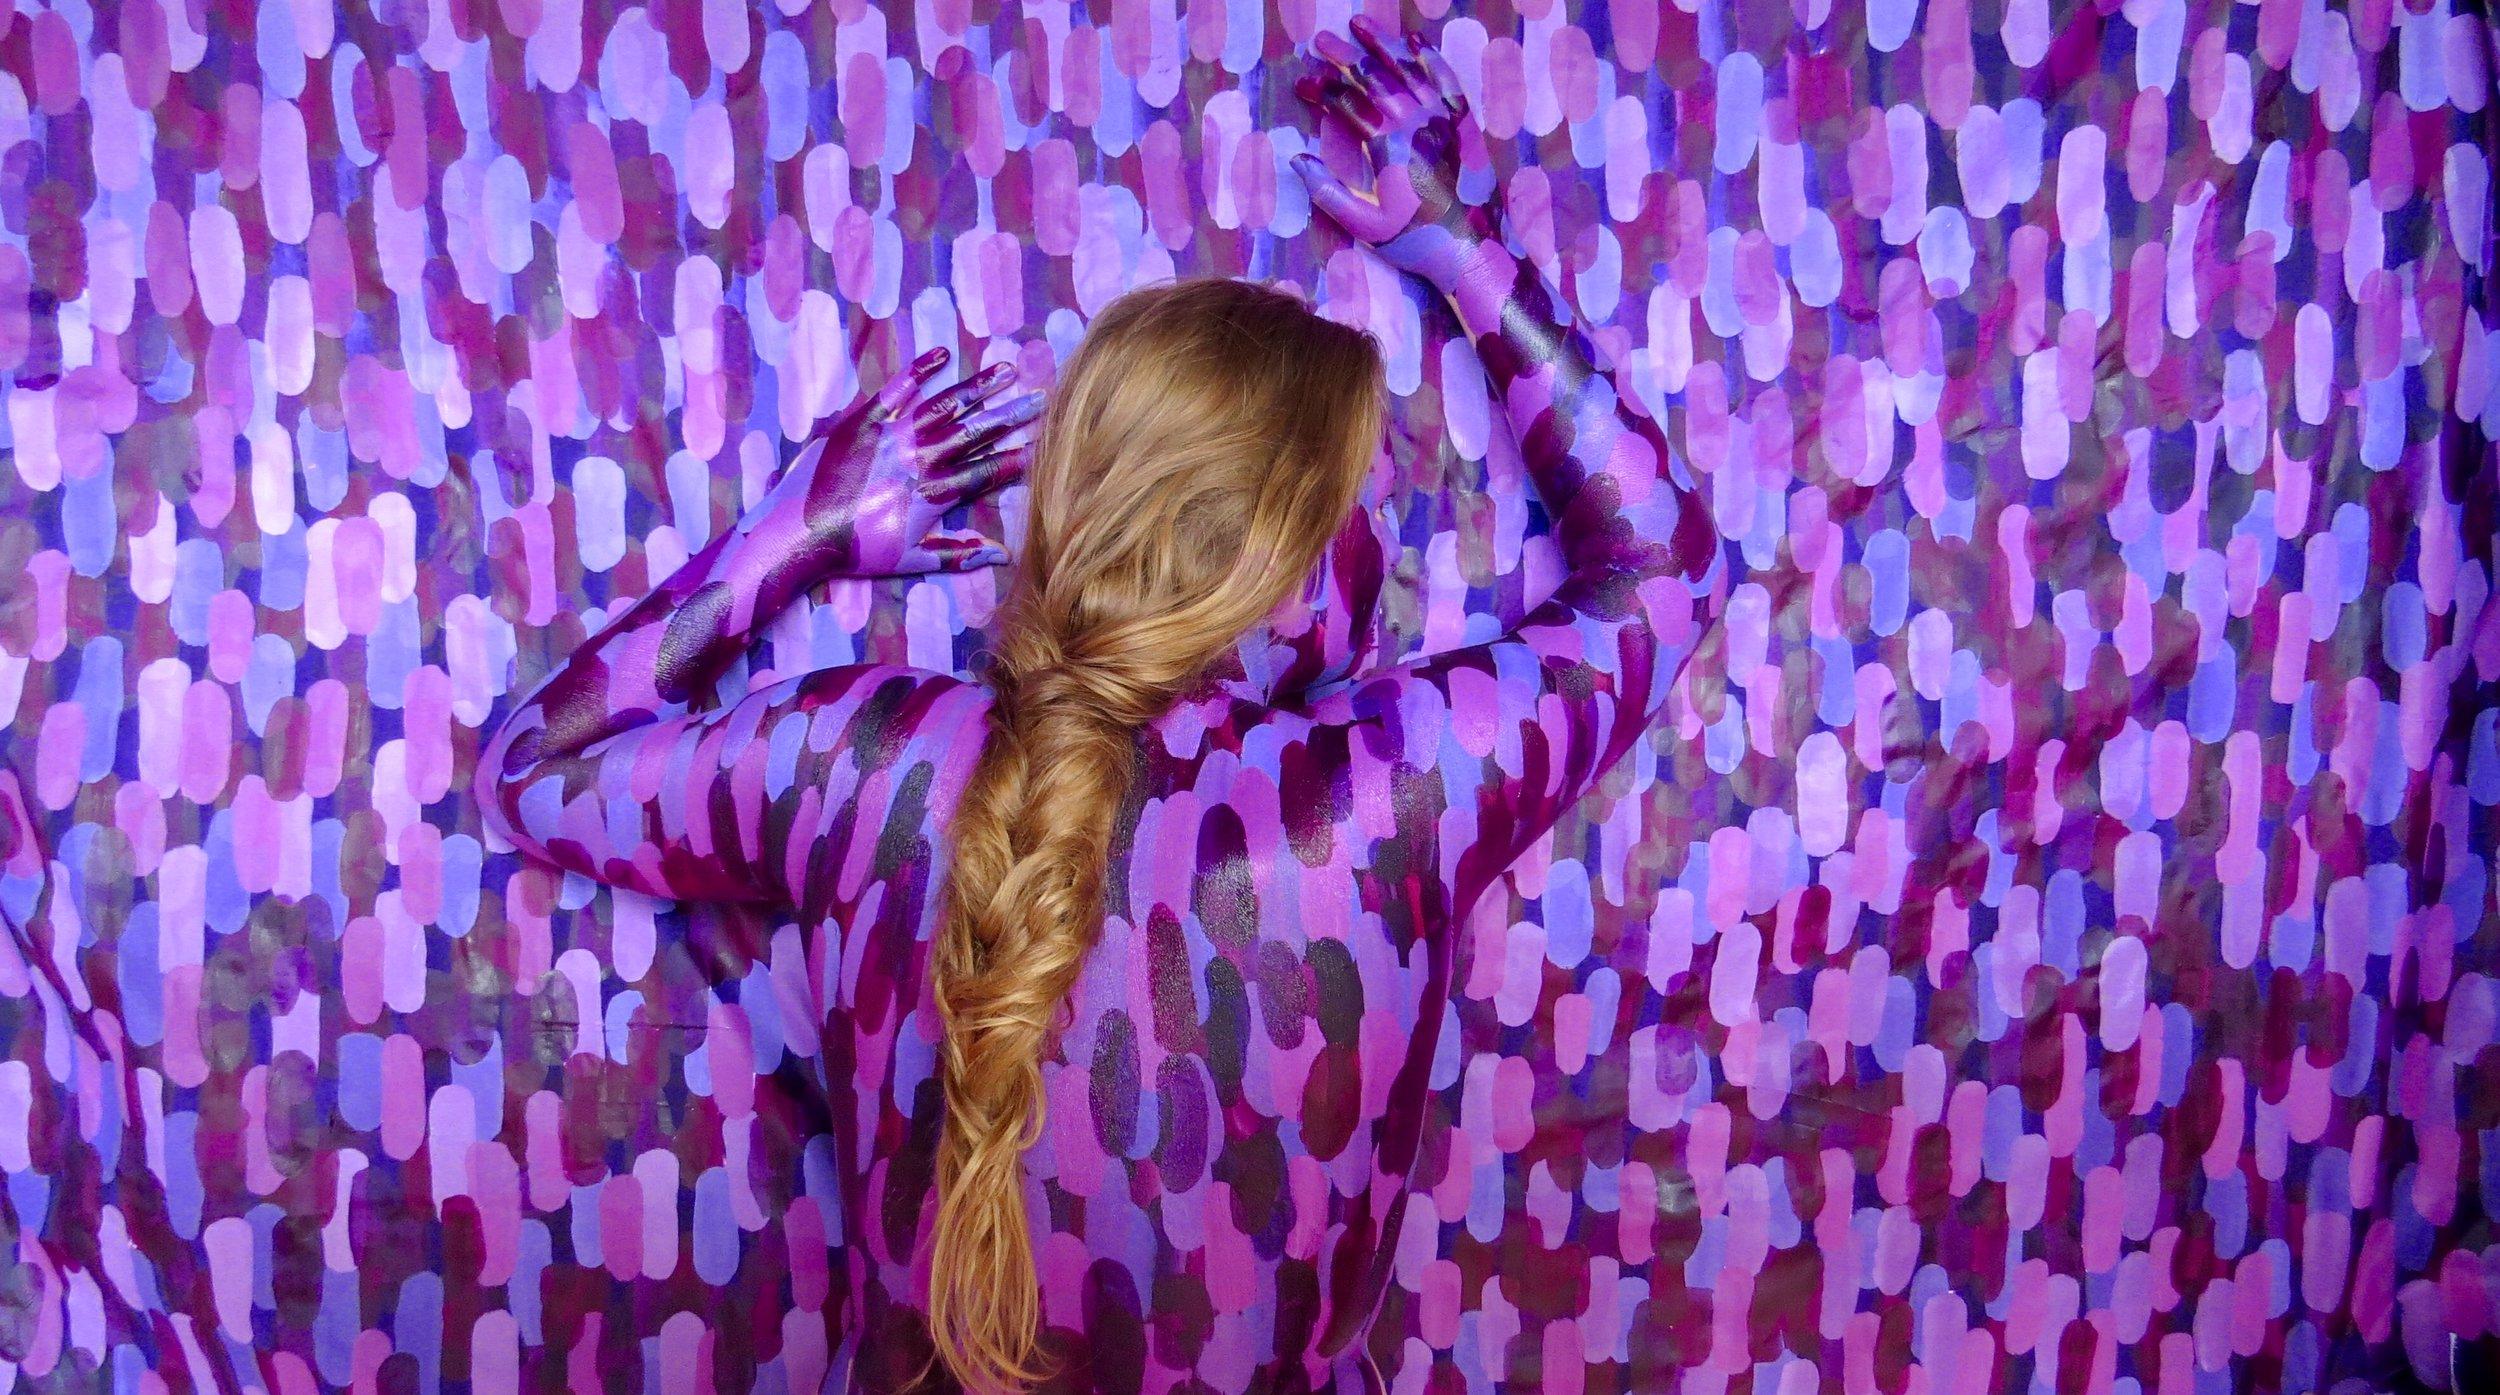 Jenna Camilleon Pt. II, Photograph of Acrylic on Fabric and Skin, 2016